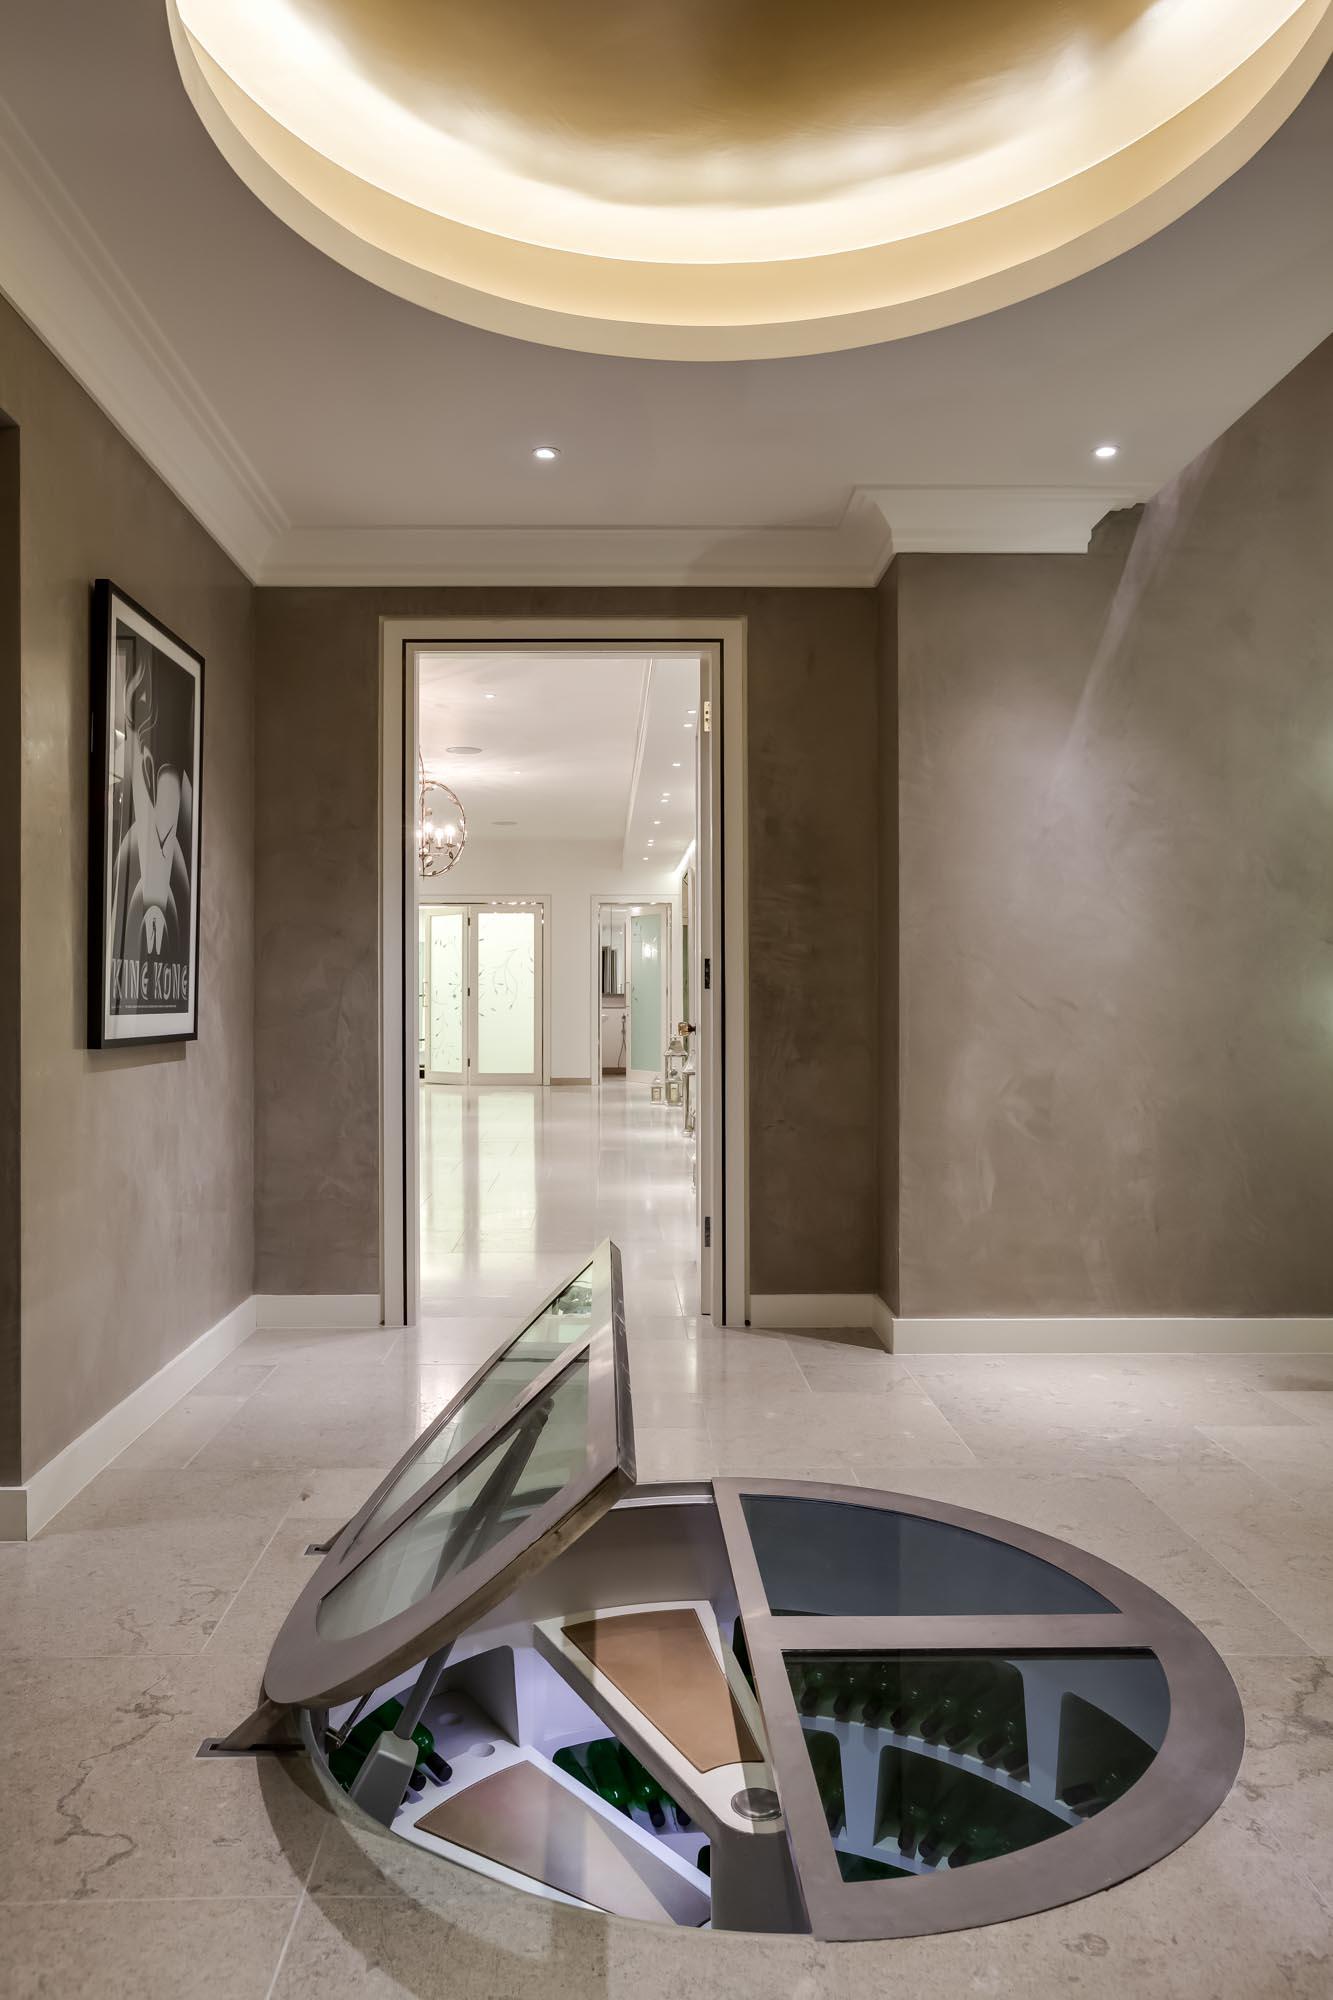 hyde park jonathan bond photography, residential development, tessuto interiors